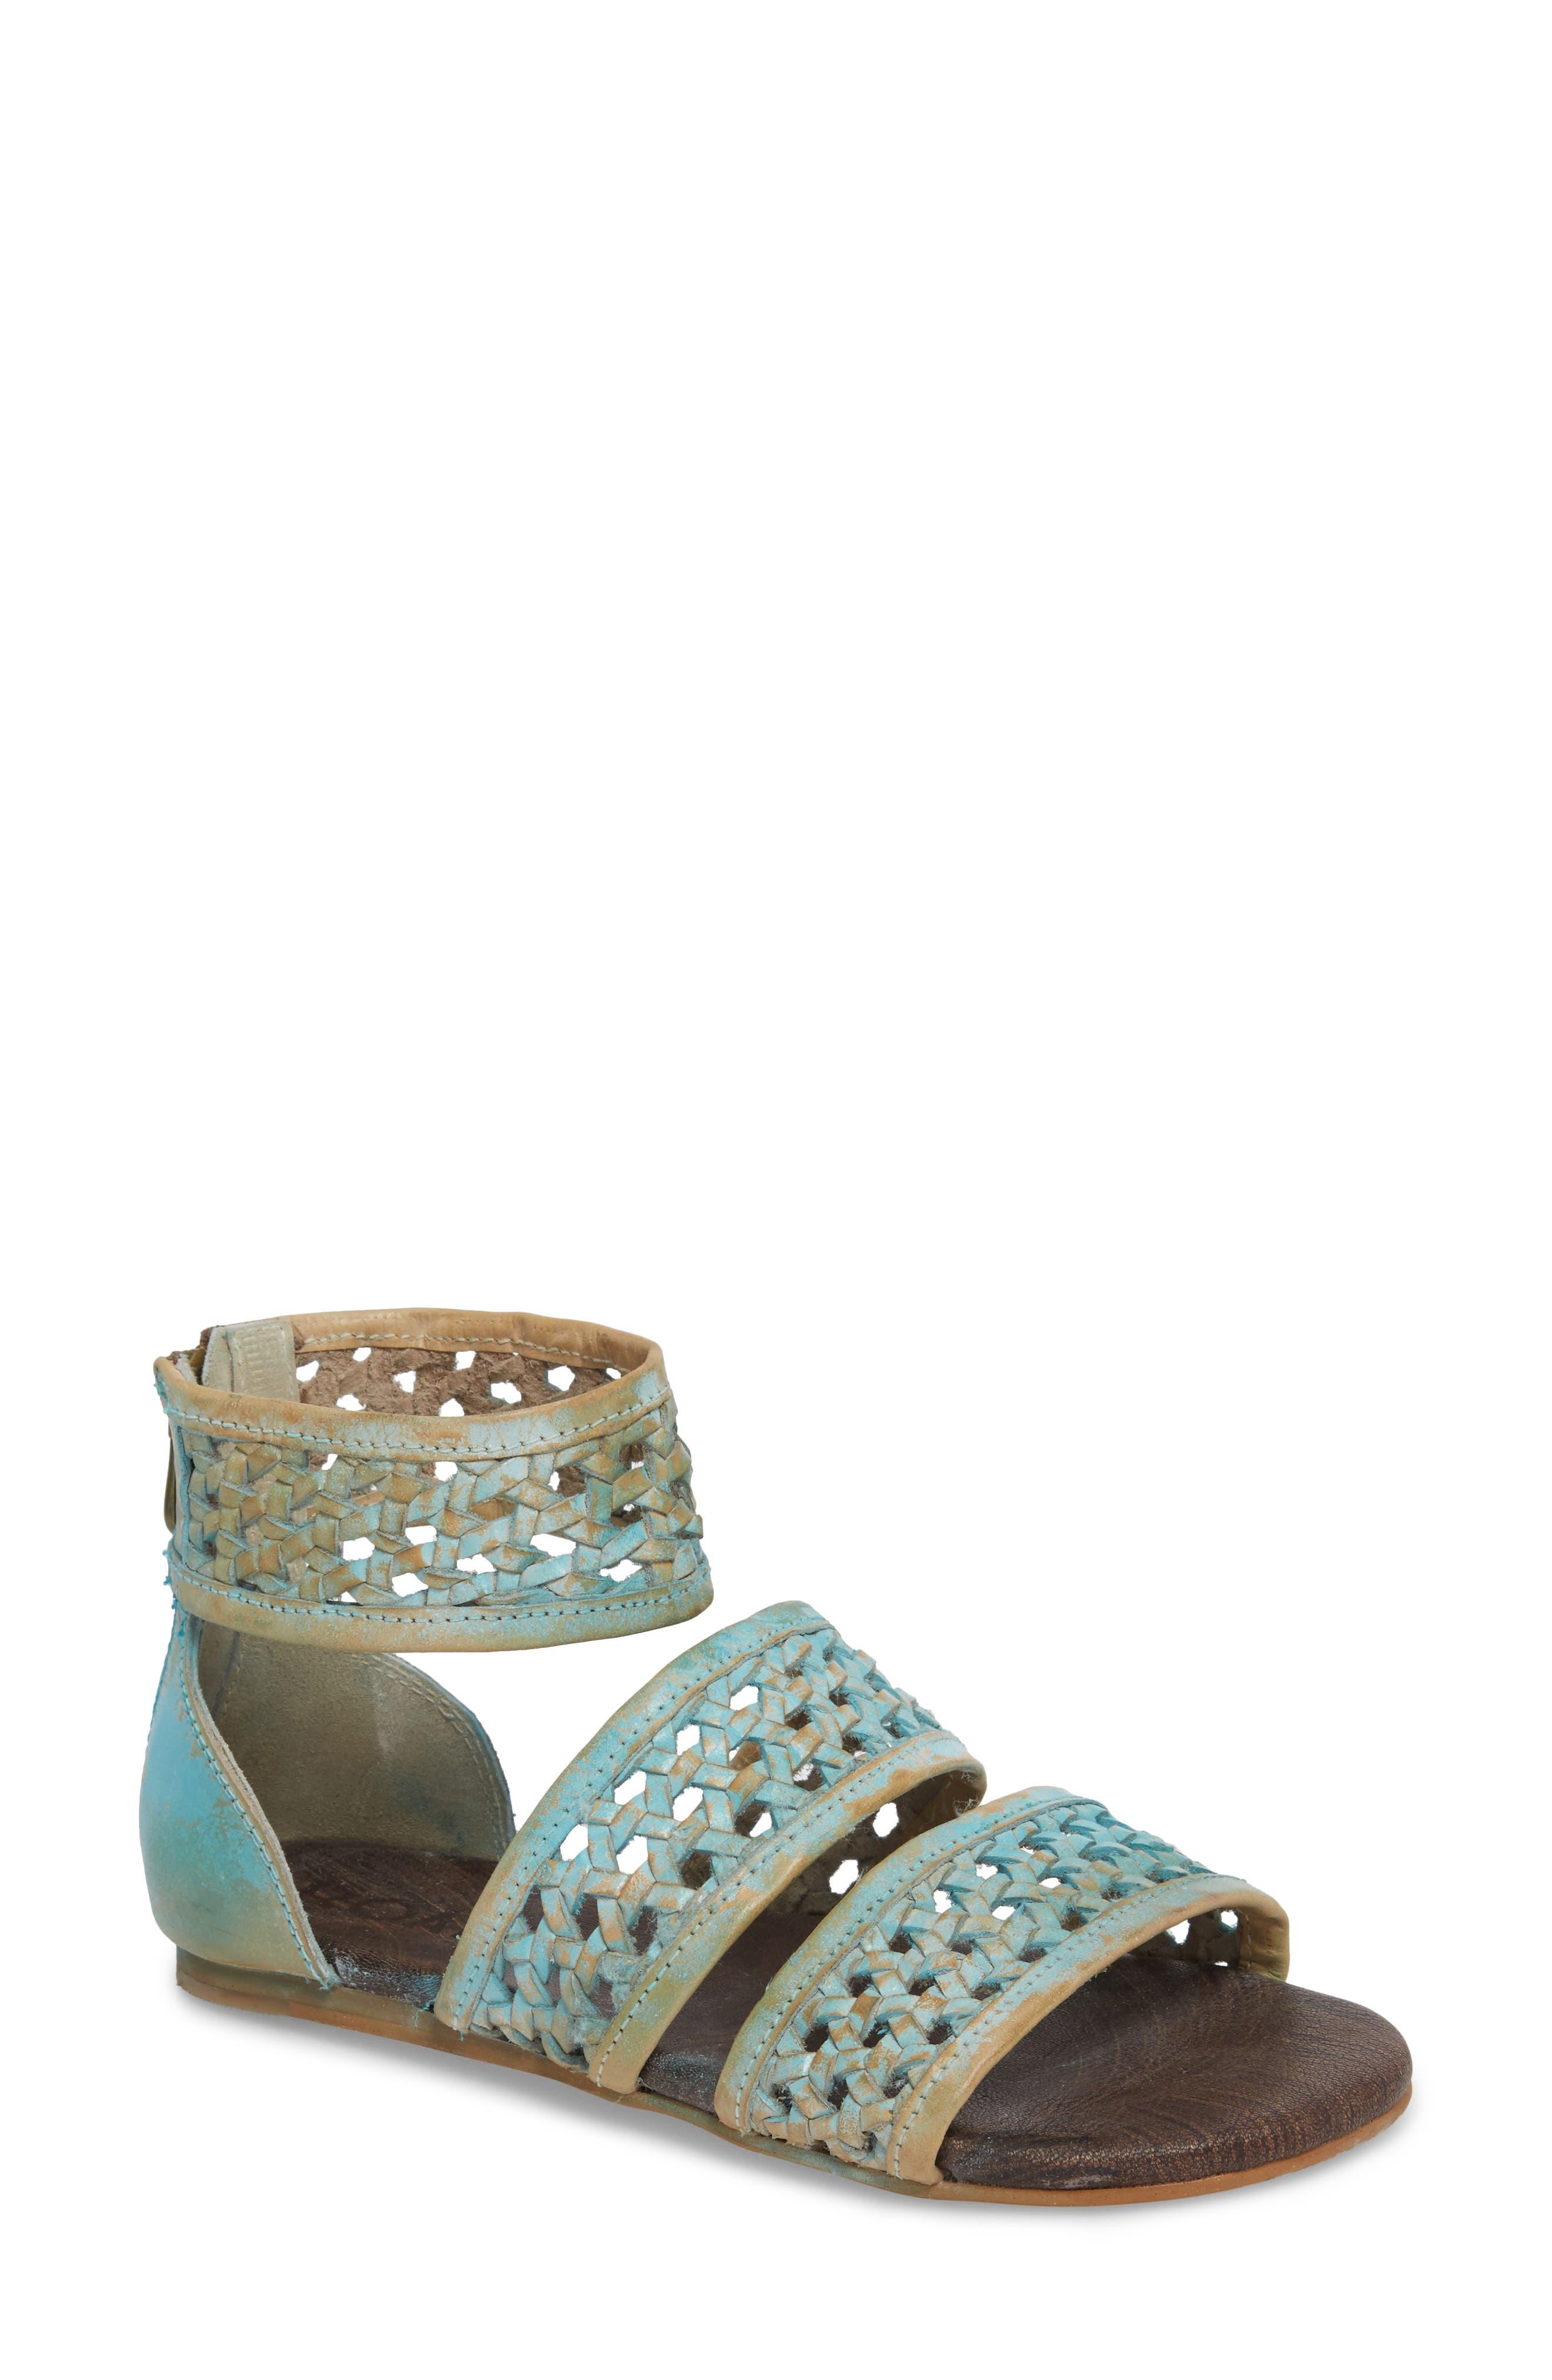 Clio Woven Ankle Cuff Sandal,                         Main,                         color, Blue